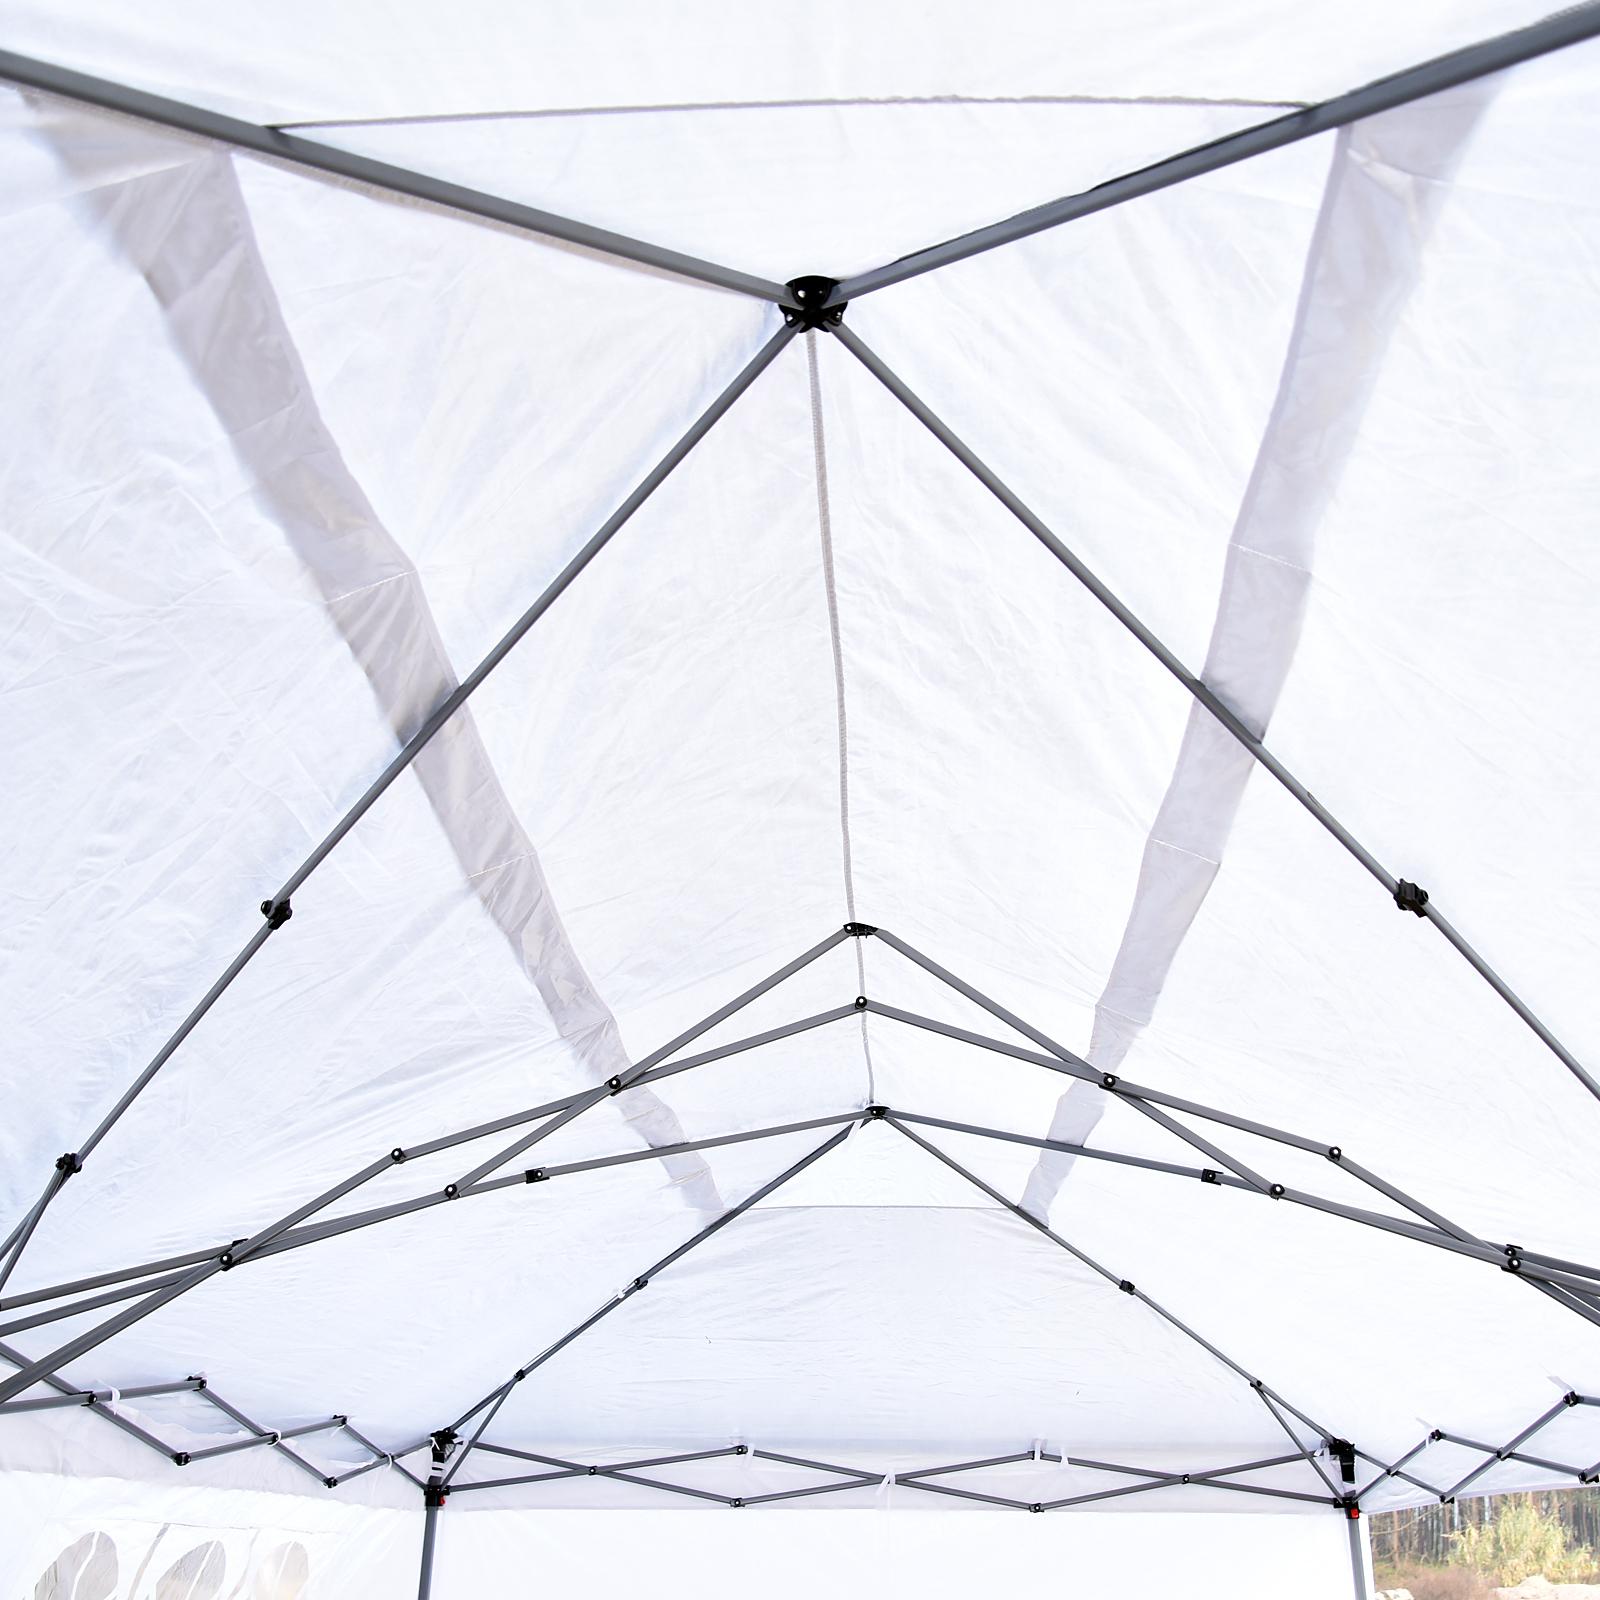 Outdoor-10-039-x20-039-EZ-POP-UP-Gazebo-Wedding-Party-Tent-Canopy-Folding-w-Carry-Bag thumbnail 50